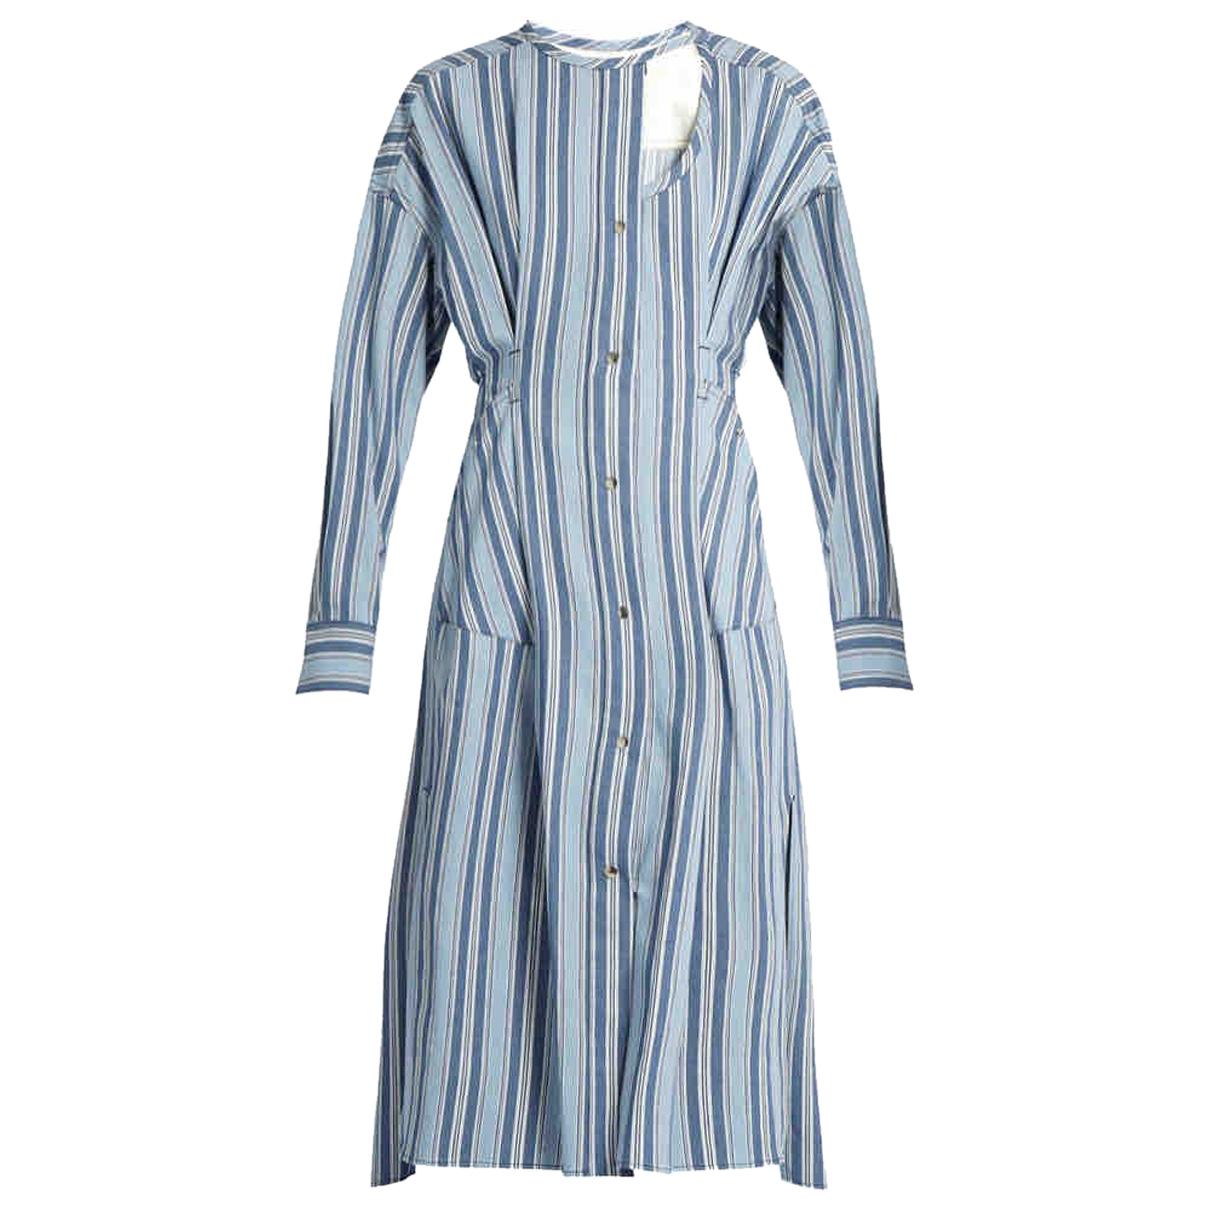 Isabel Marant N Blue Cotton dress for Women 42 FR